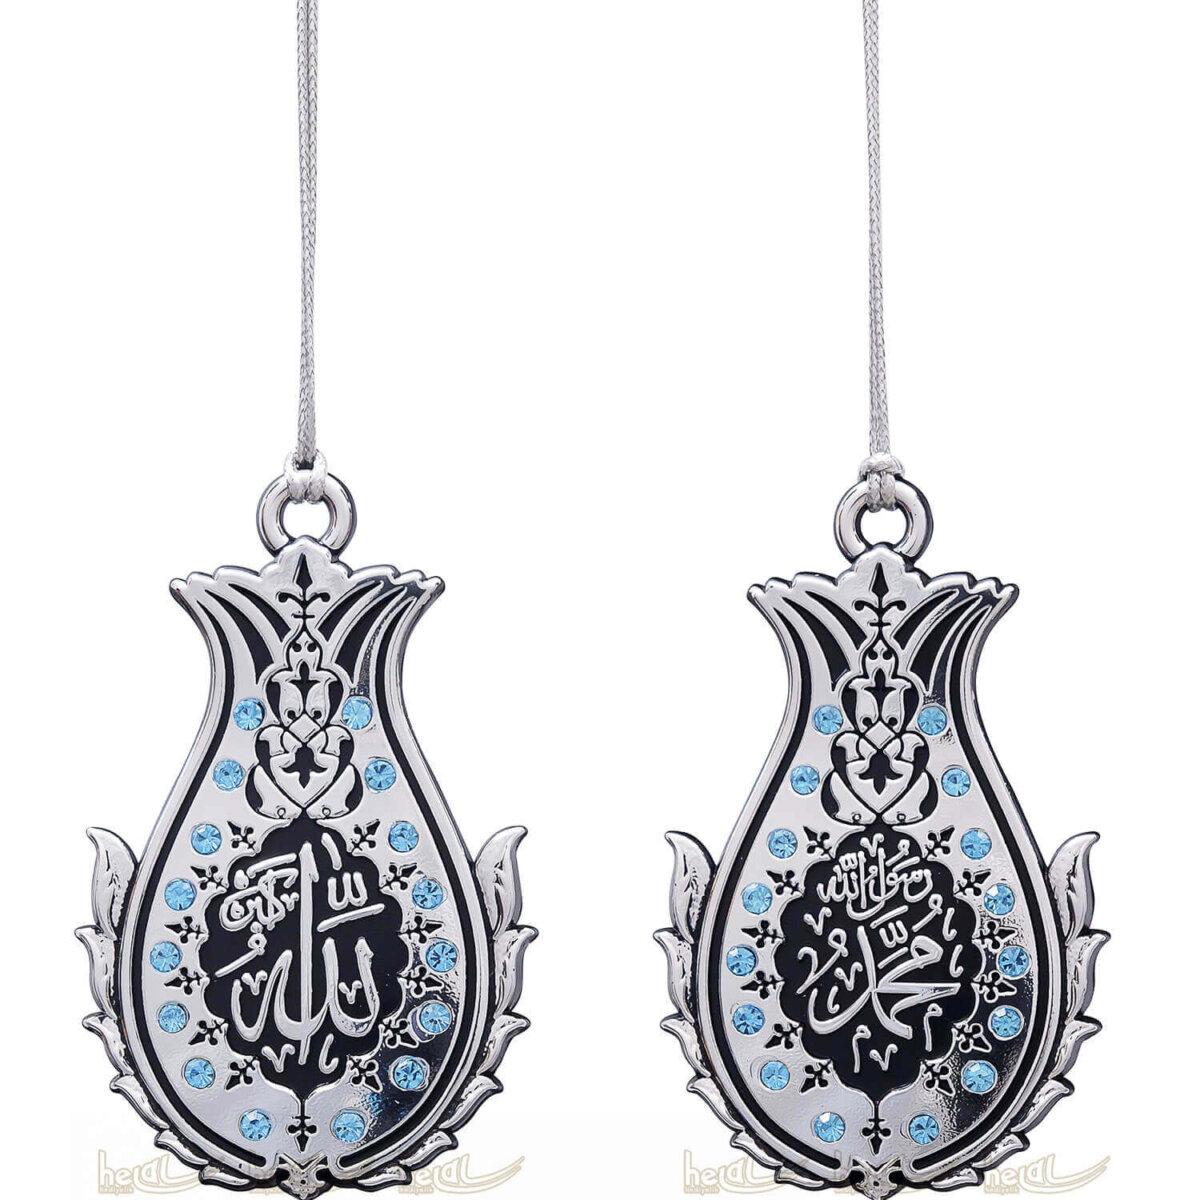 Allah cc – Muhammed sav Lafzı Gümüş Araç Süsü, Anahtarlık, Aksesuar Allah cc – Muhammed sav Lafzı Gümüş Araç Süsü, Anahtarlık, Aksesuar